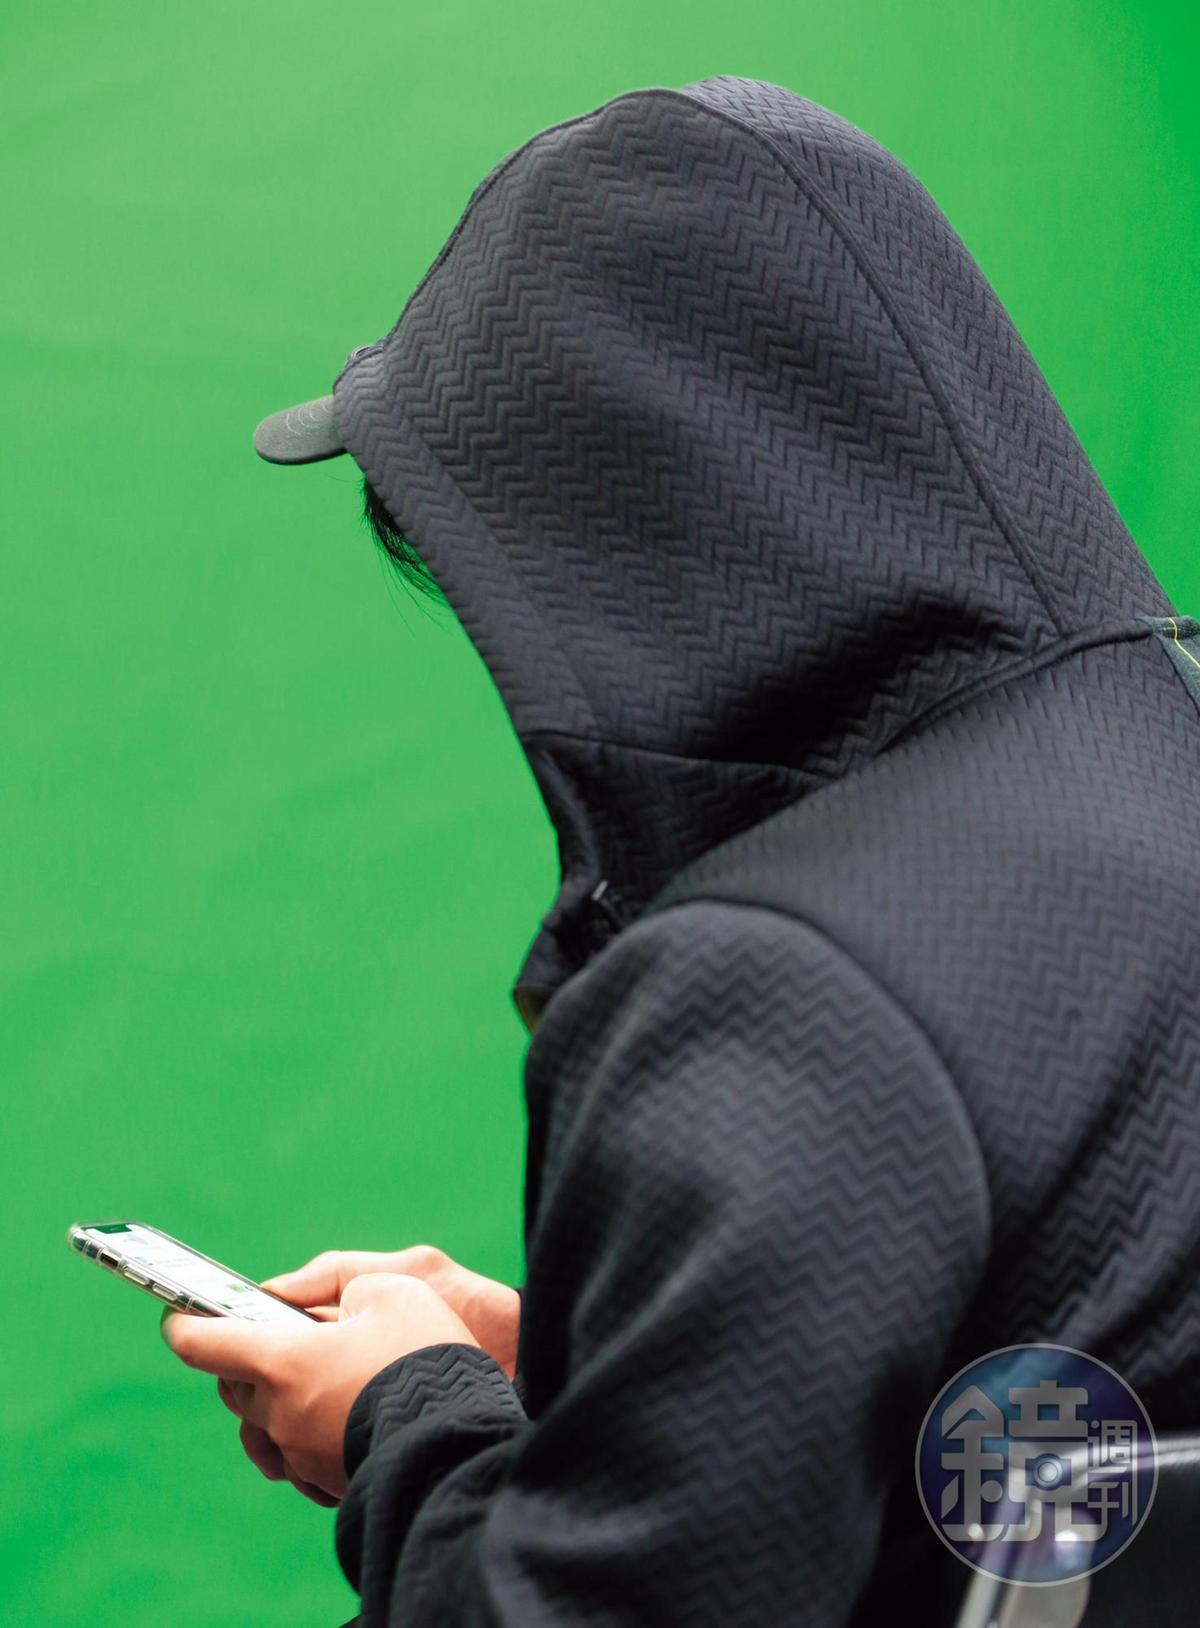 X先生(圖)秀出手機內的受害者群組表示,李冠億在兩岸到處騙錢,甚至有大陸受害人被騙了人民幣800萬元(約新台幣3400多萬元)。